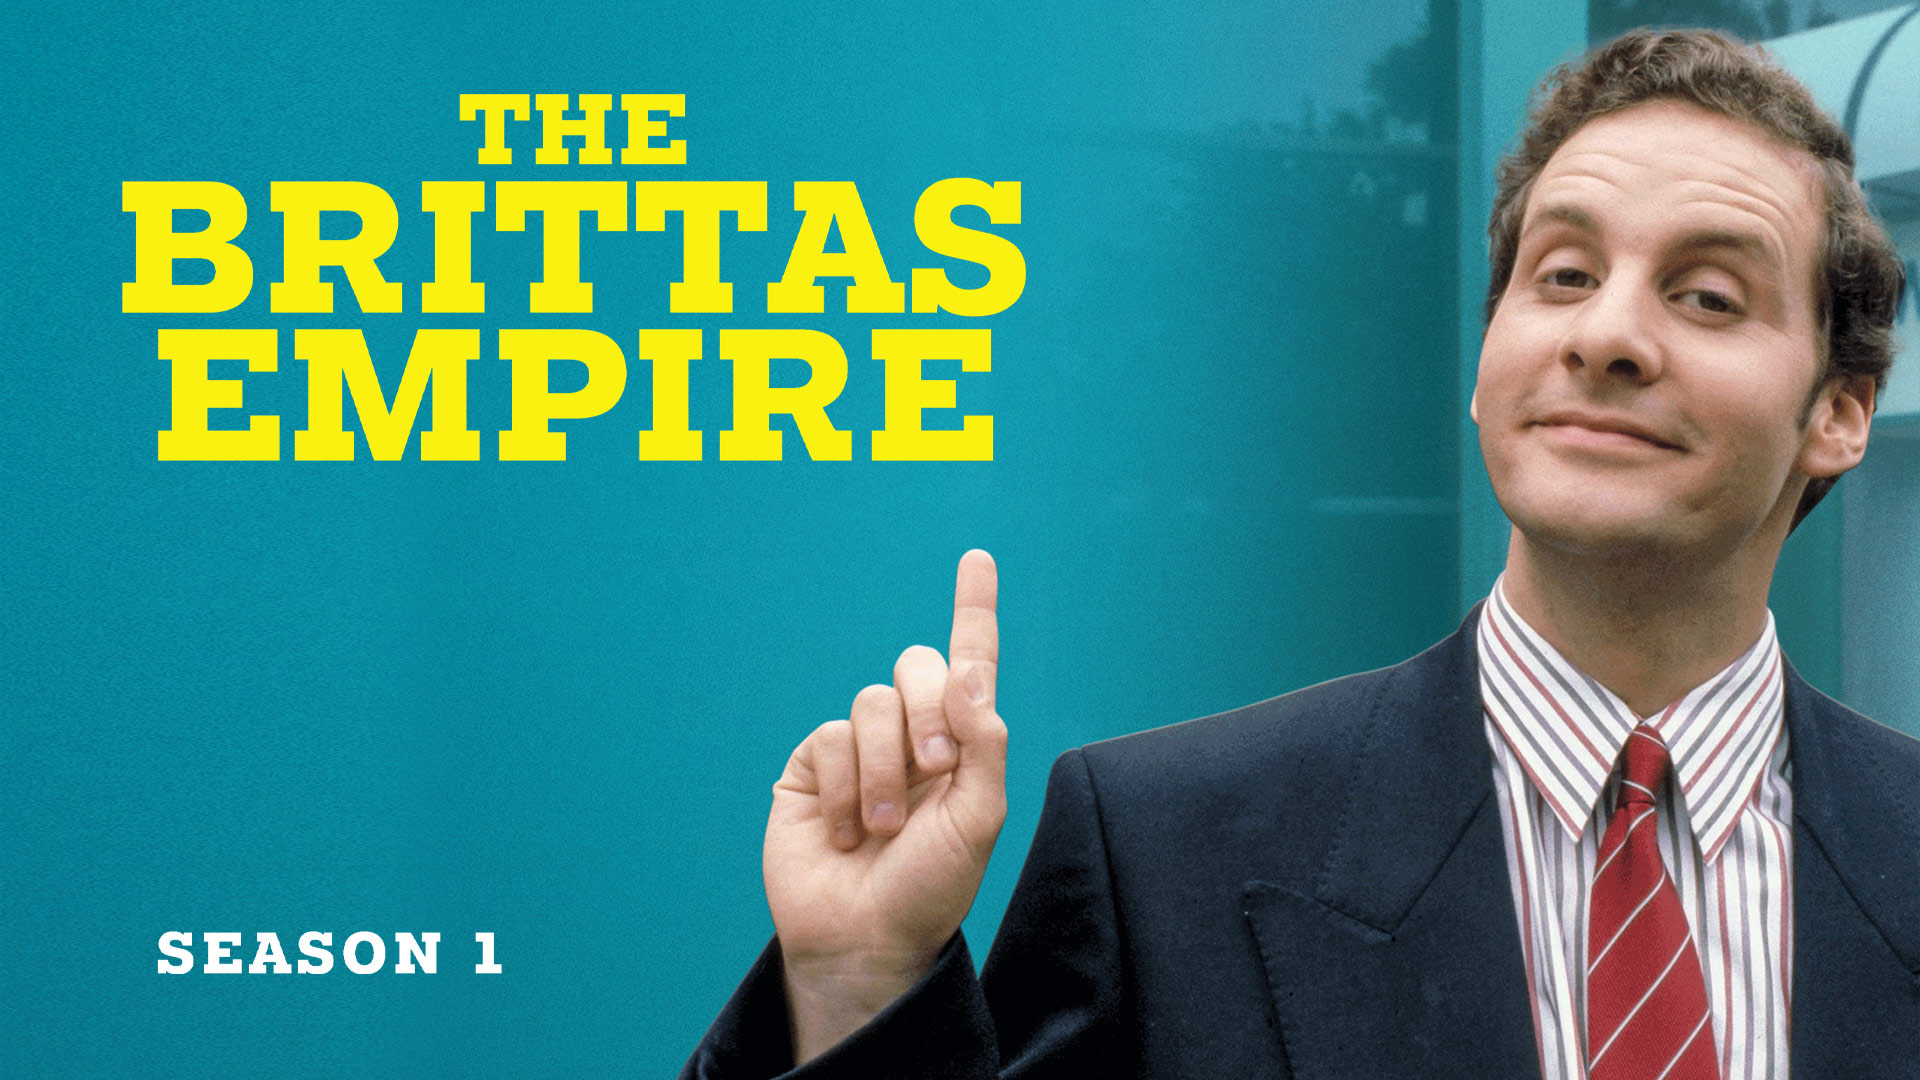 The Brittas Empire, Season 1